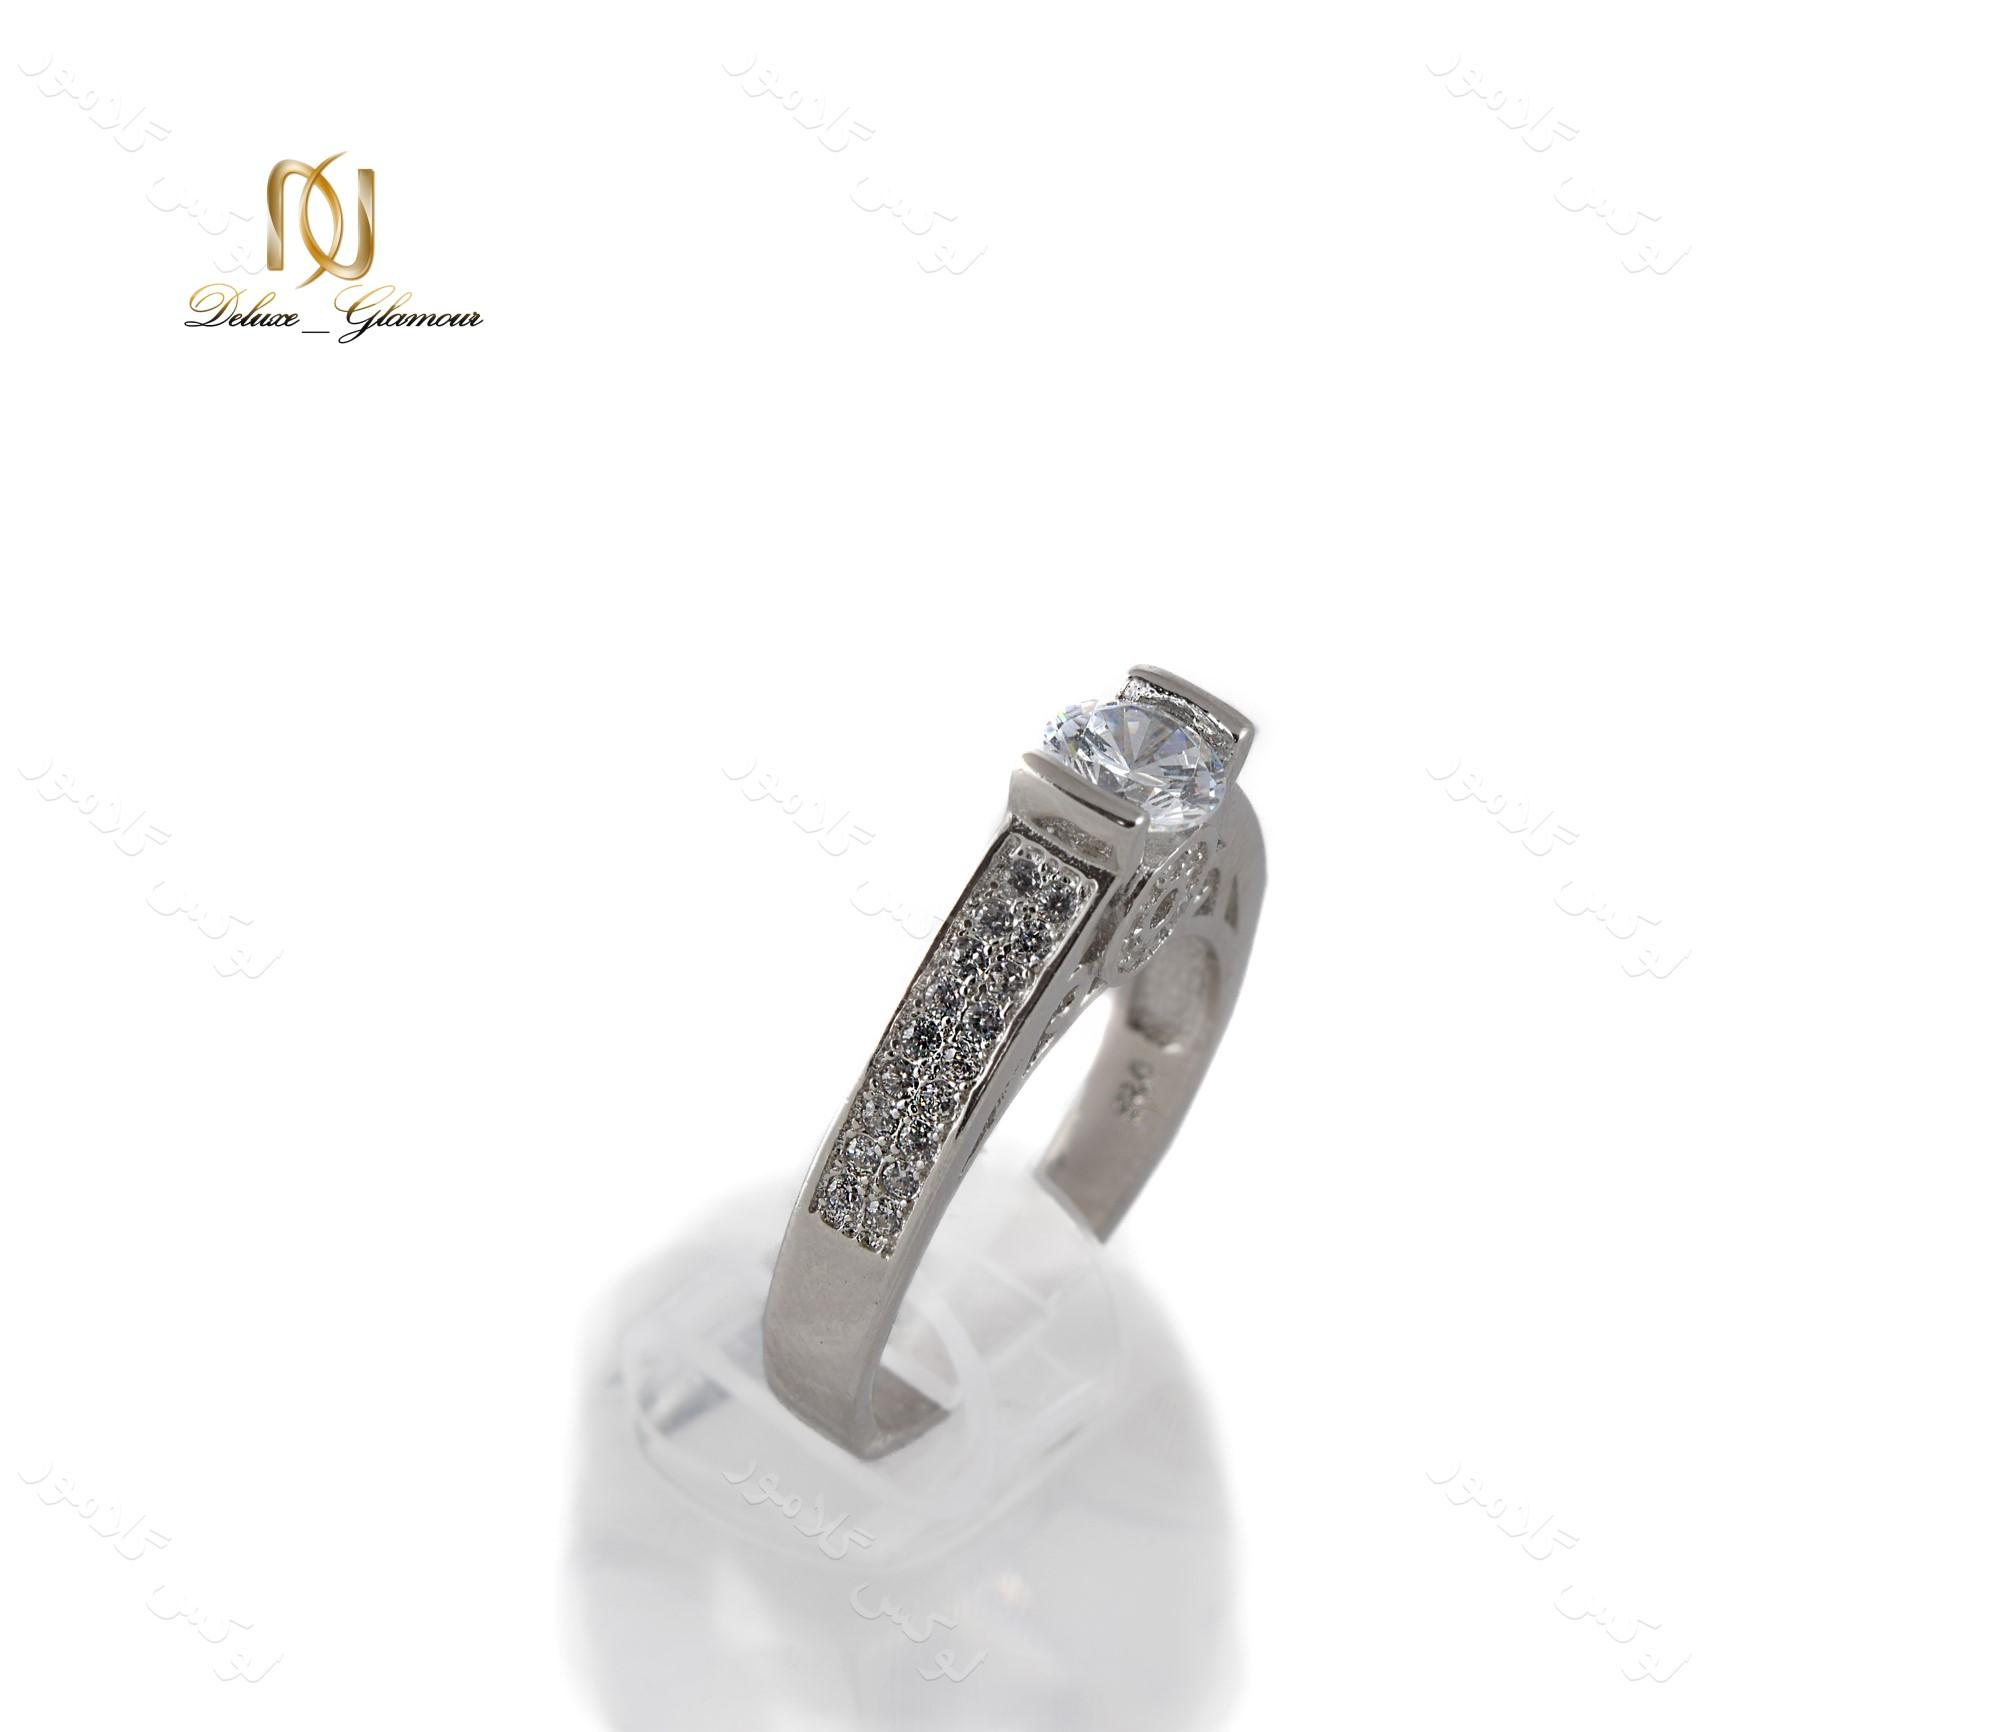 انگشتر نقره زنانه لوکس با تاج سه بعدی Rg-n234 (3)